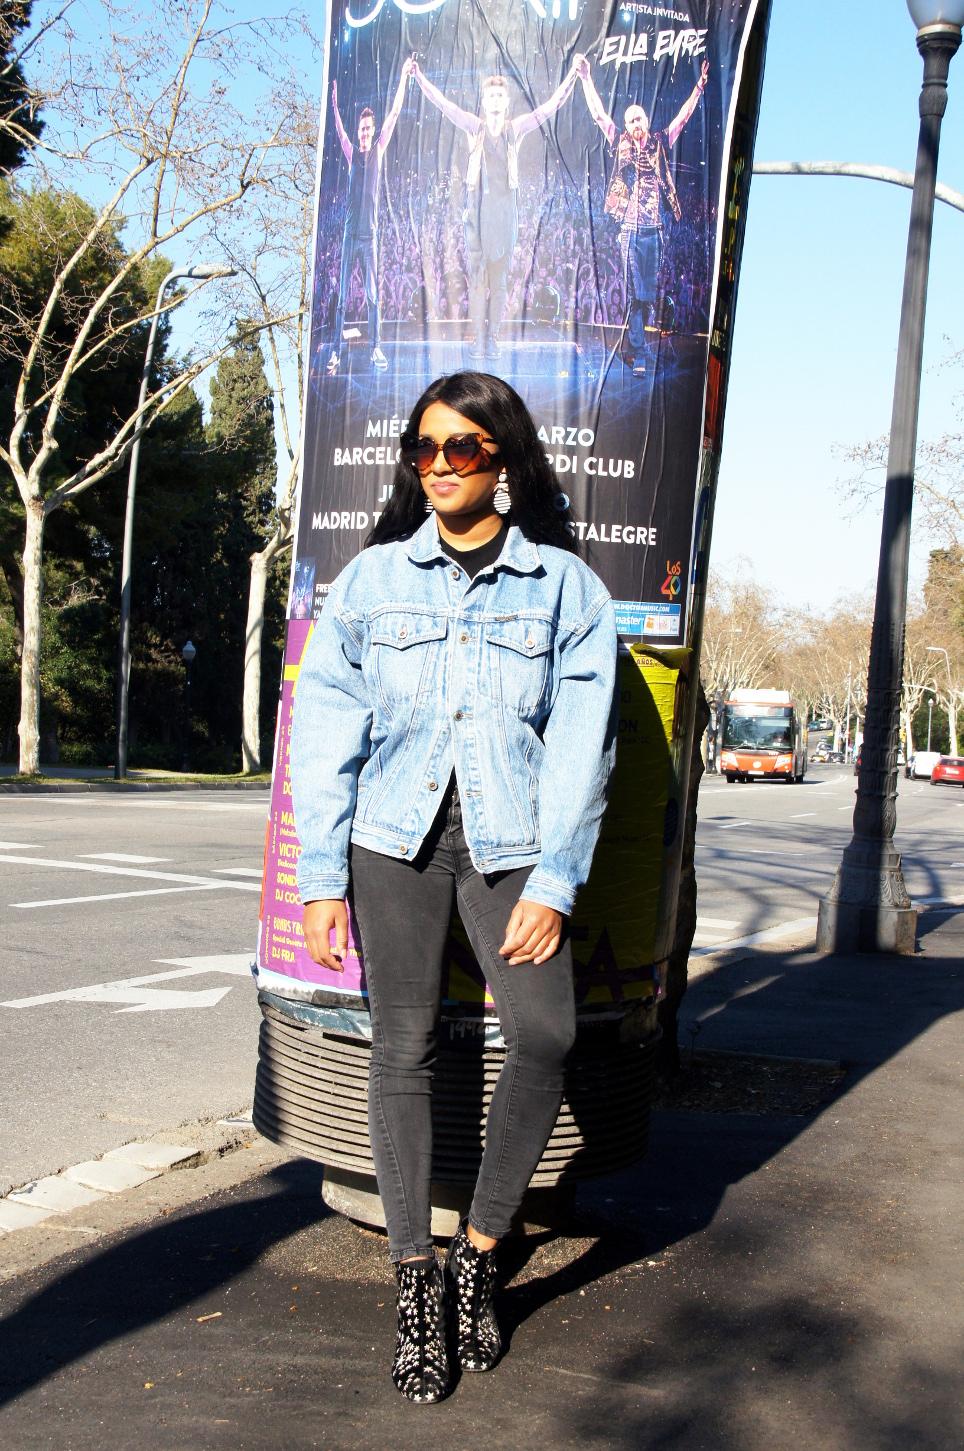 Me wearing my vintage denim jacket in Barcelona